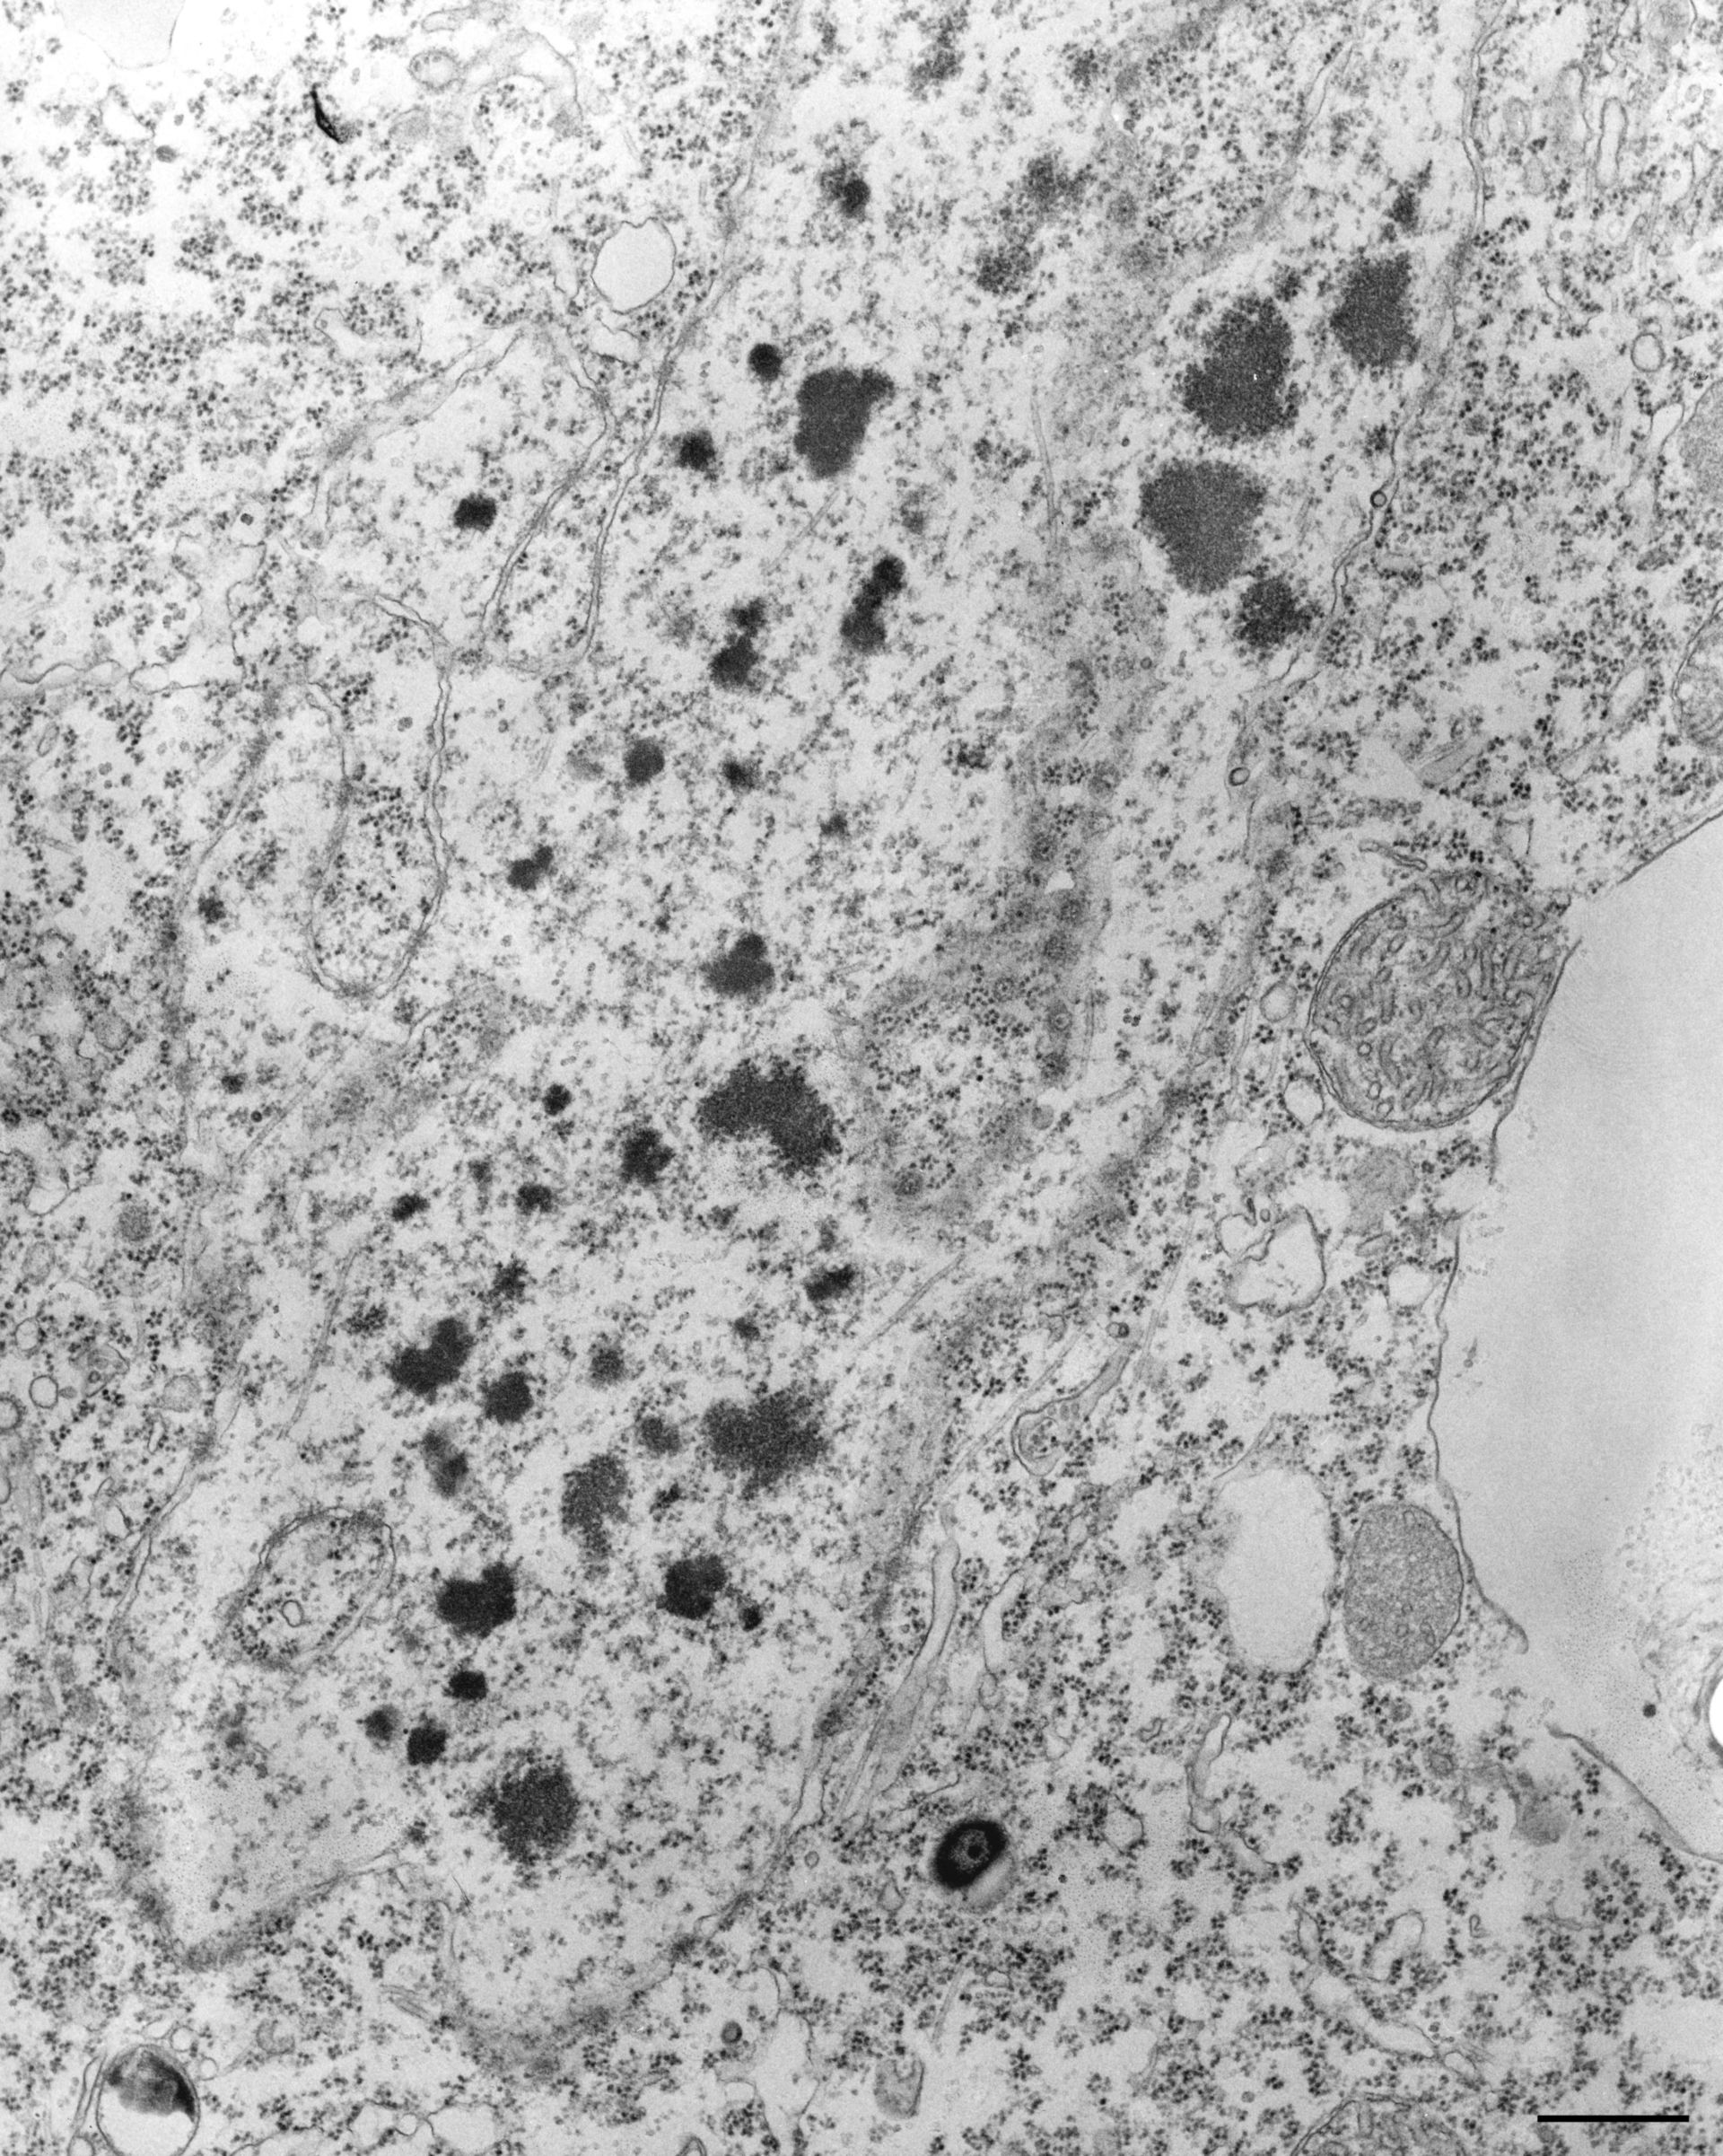 Tetrahymena pyriformis (membrana nucleare) - CIL:34614